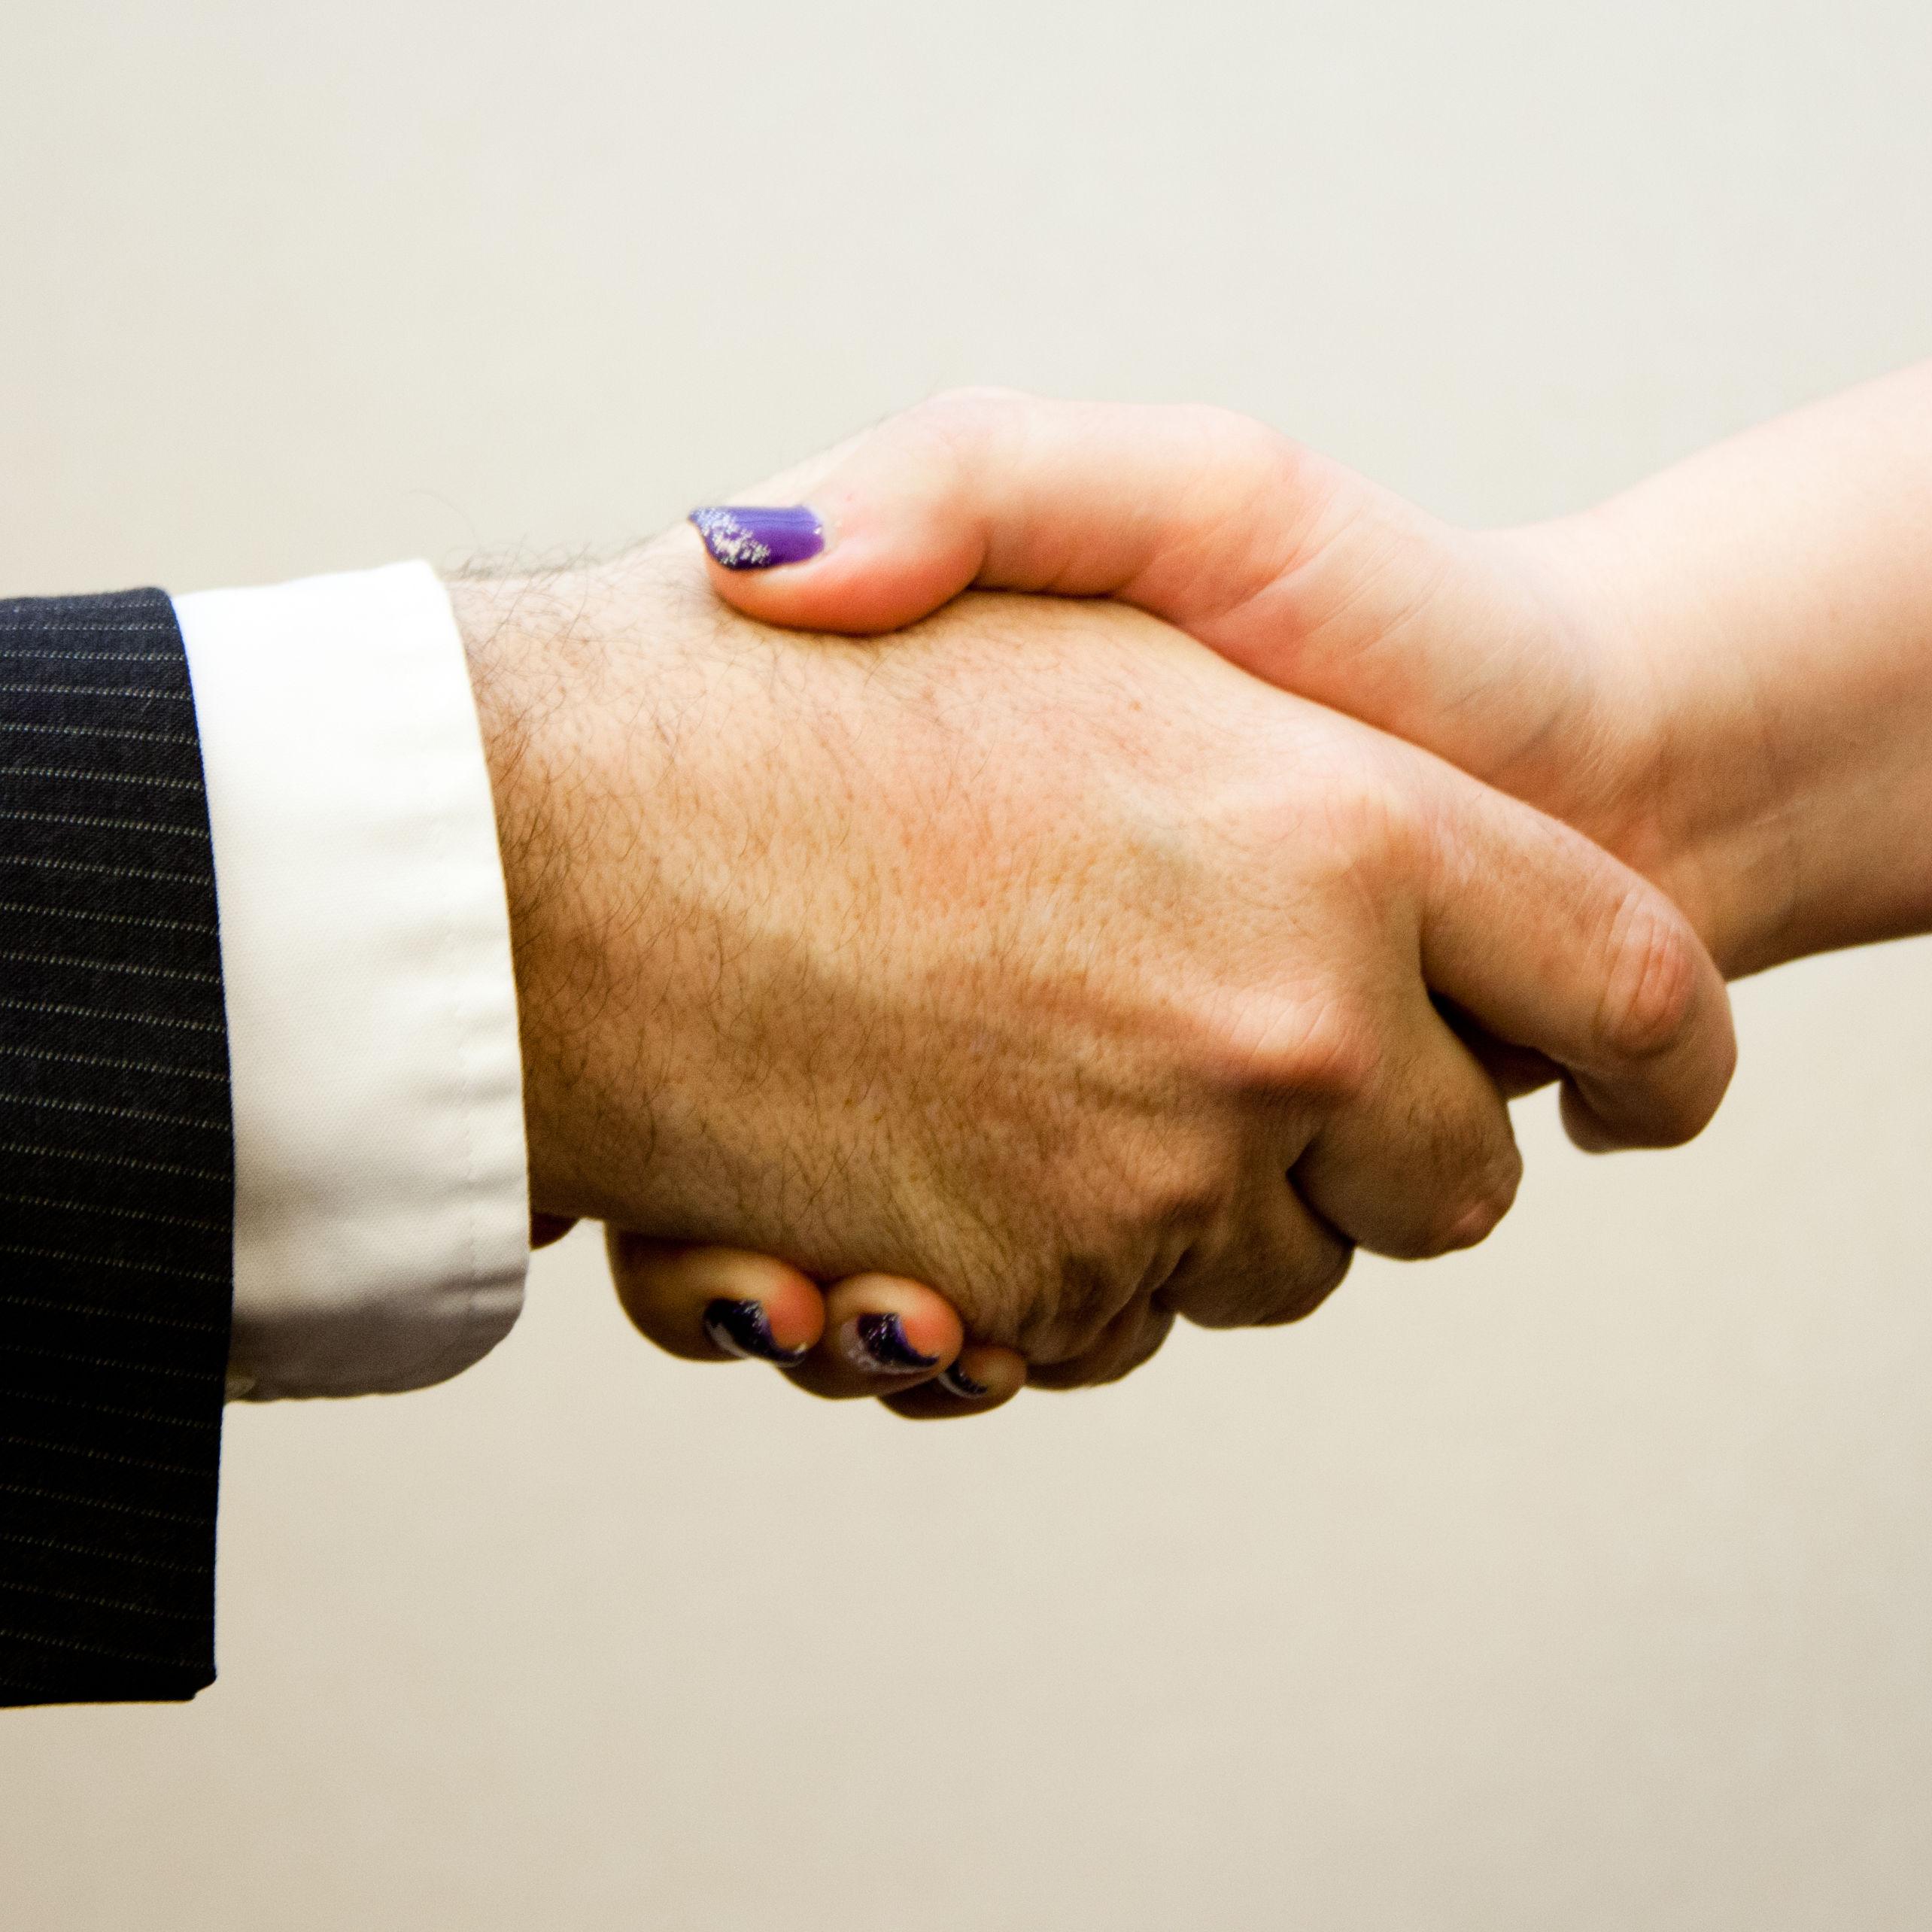 Handshake zy2jmz